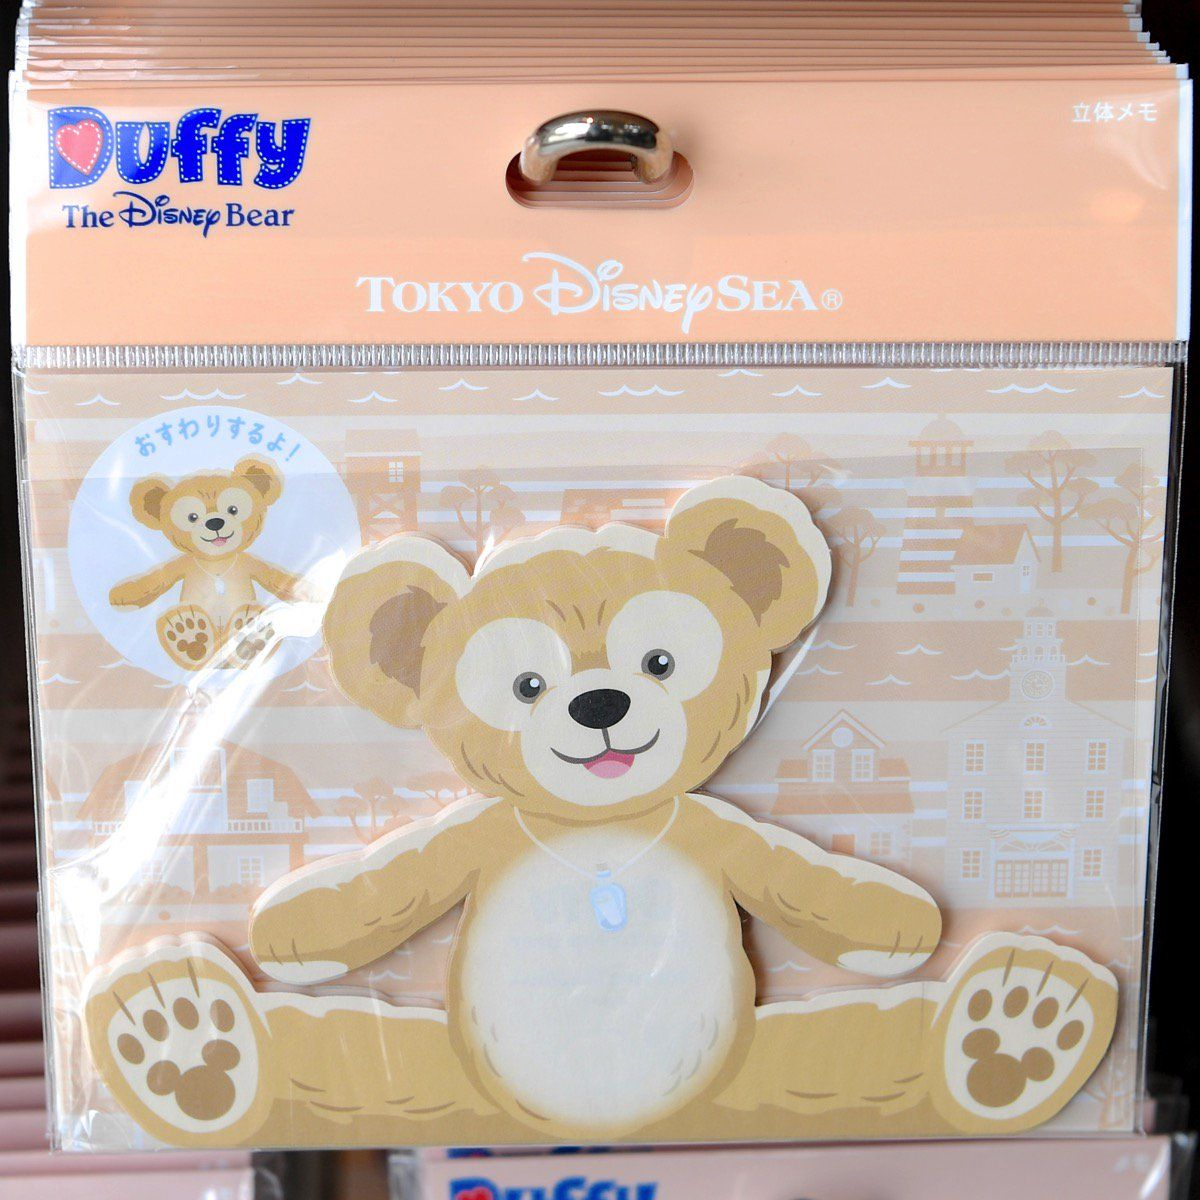 Tokyo Disney Pin 2019 TDL 101 Dalmatians TDS Disneysea Disneyland